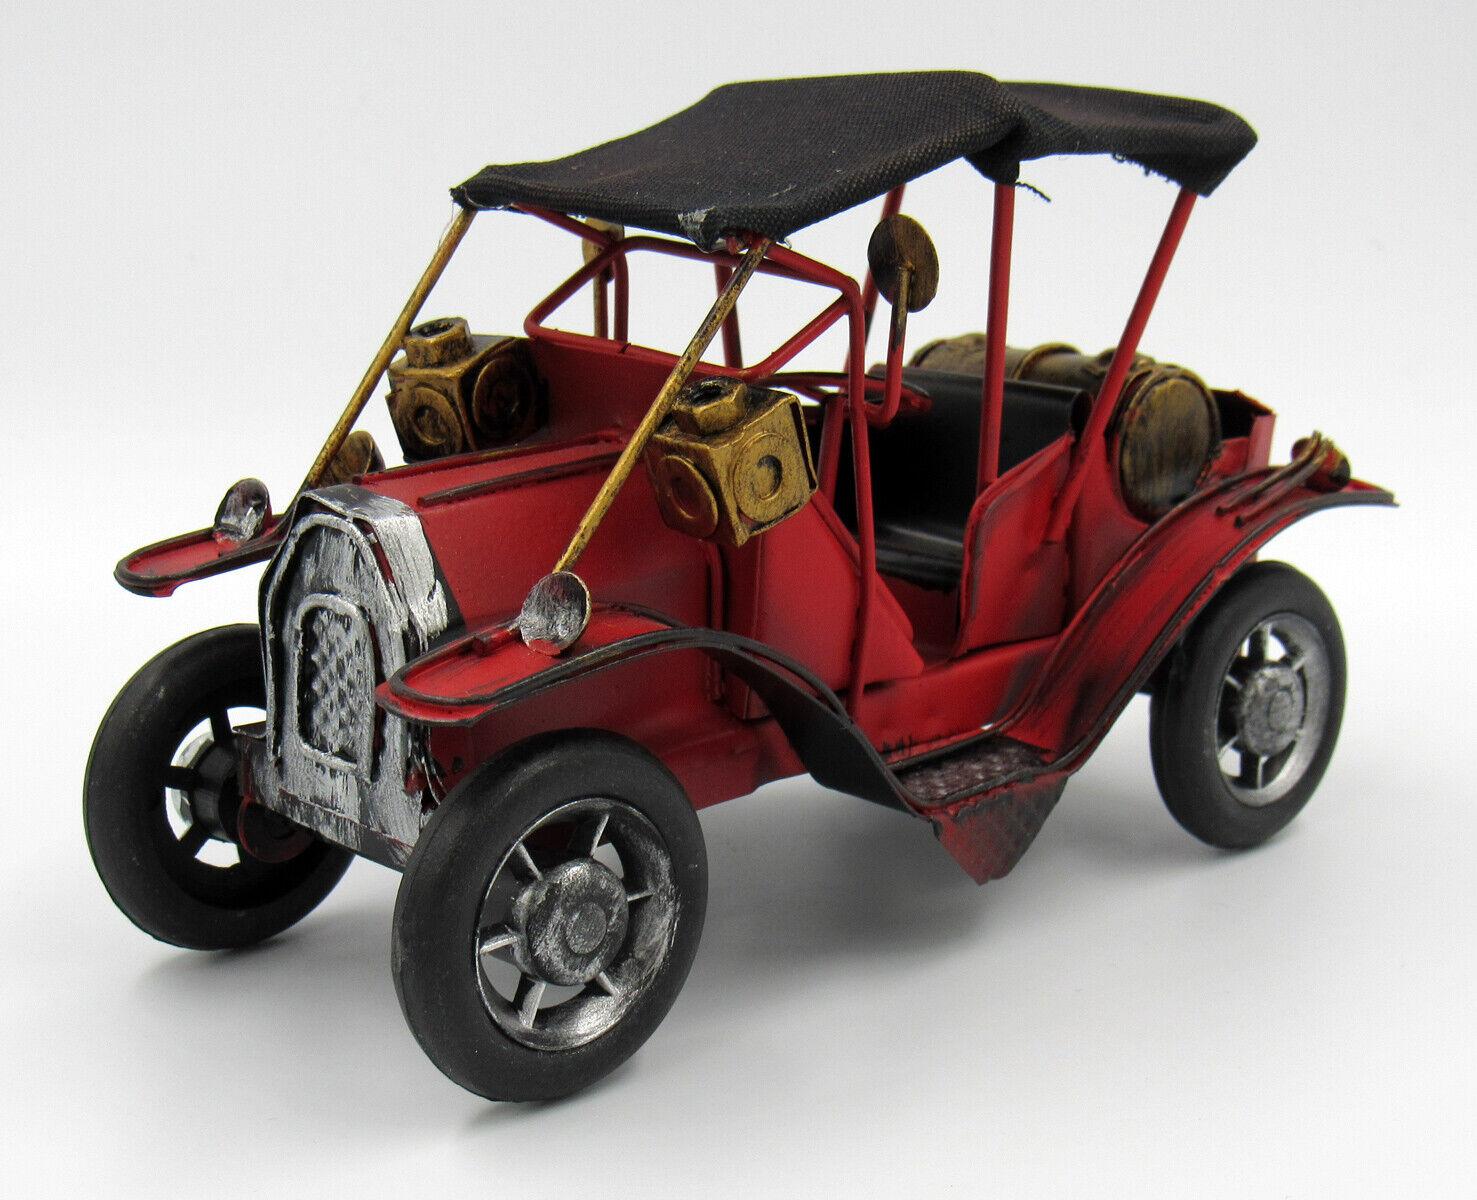 Retromobil Retromobil Retromobil Old Car Toy Red color 027cab